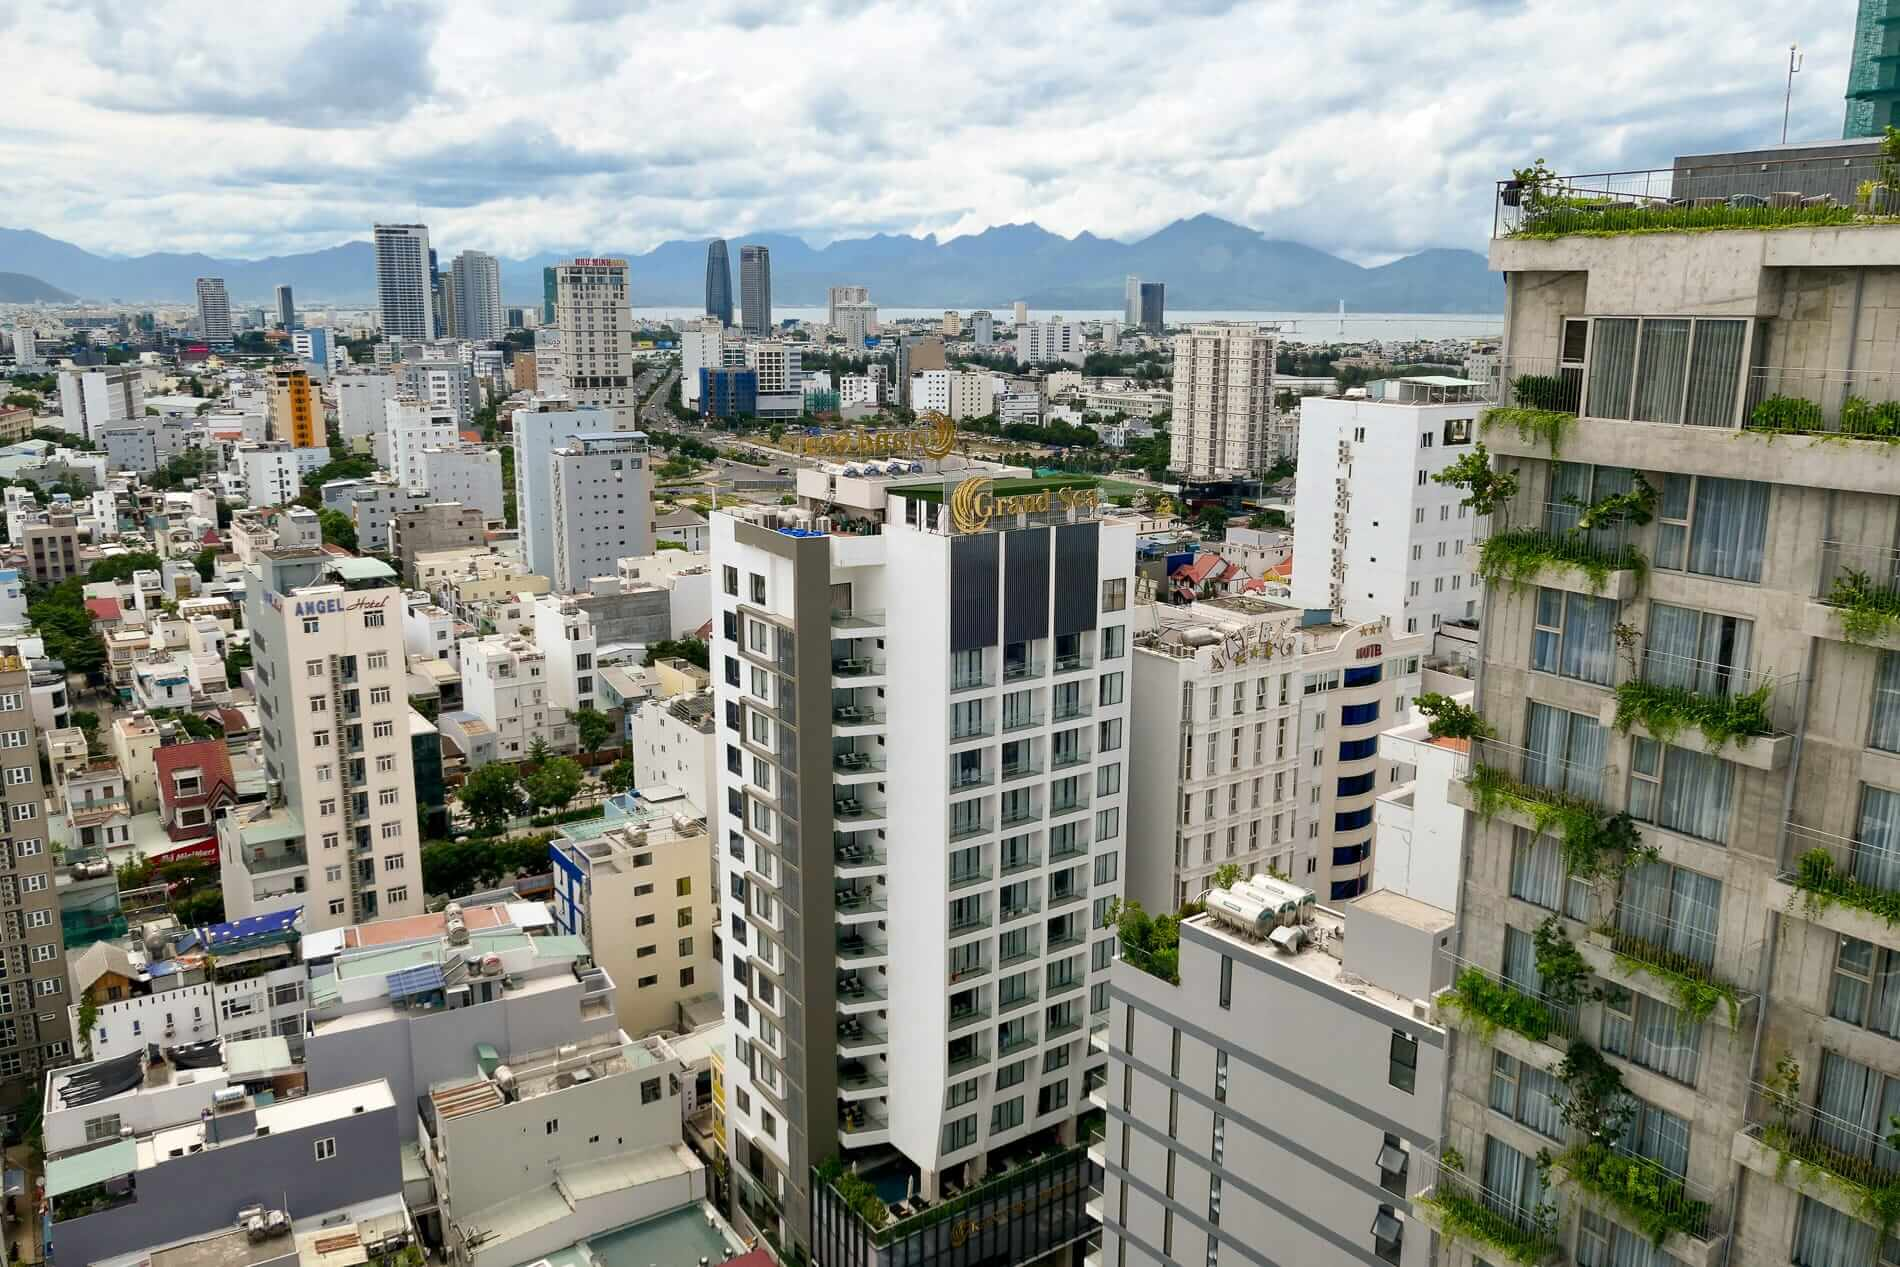 cityscape of Da Nang - where to stay in Da Nang